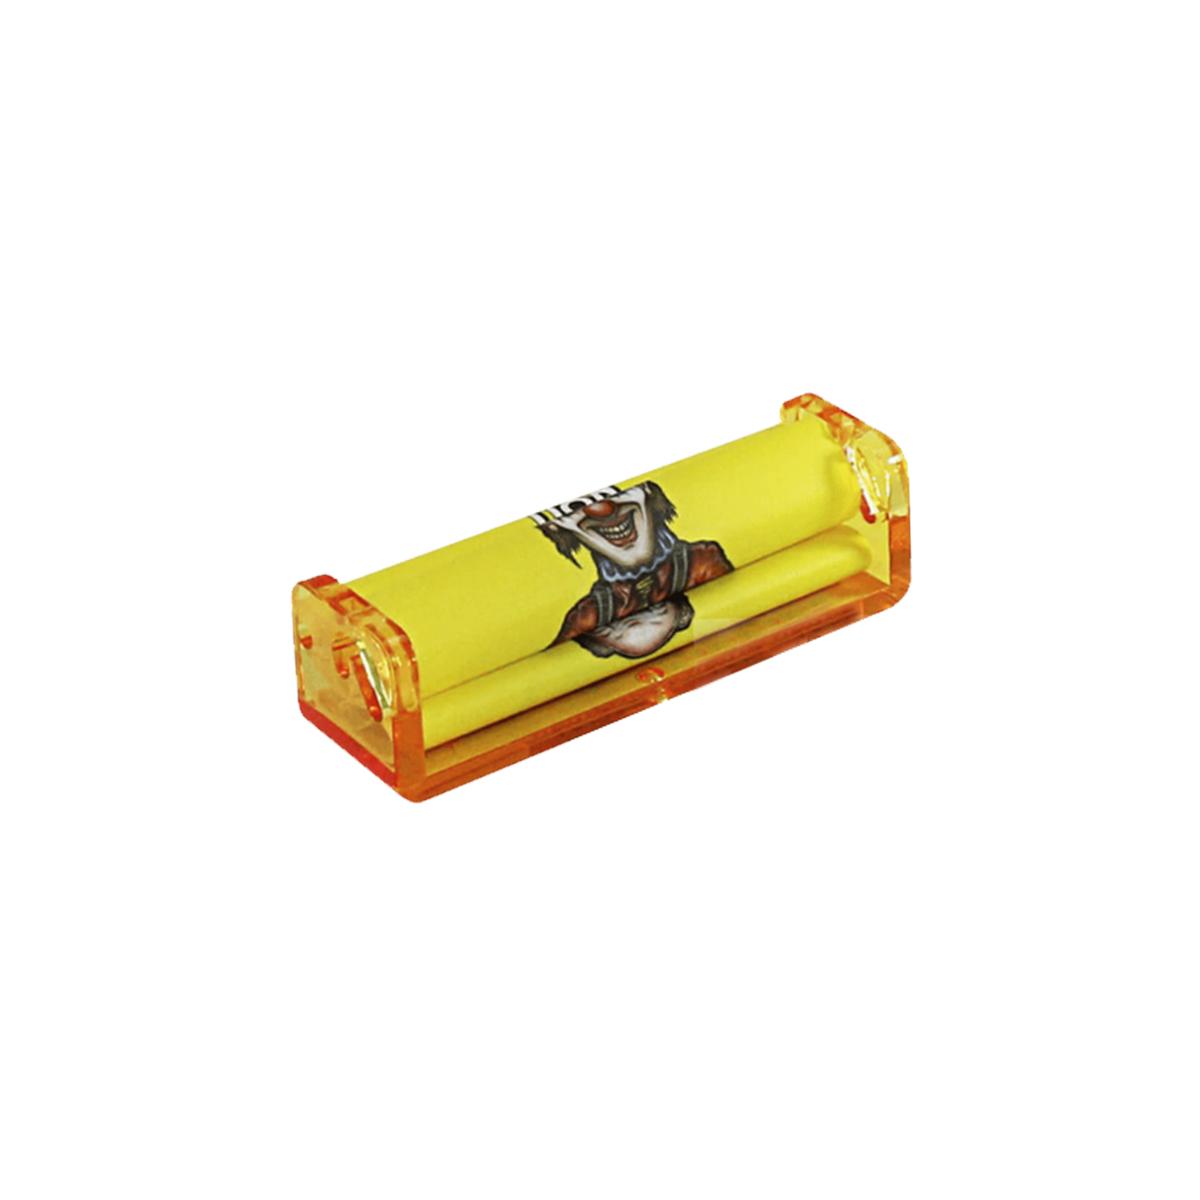 Bolador Automático Lion Rolling Circus 1.1/4 Amarelo